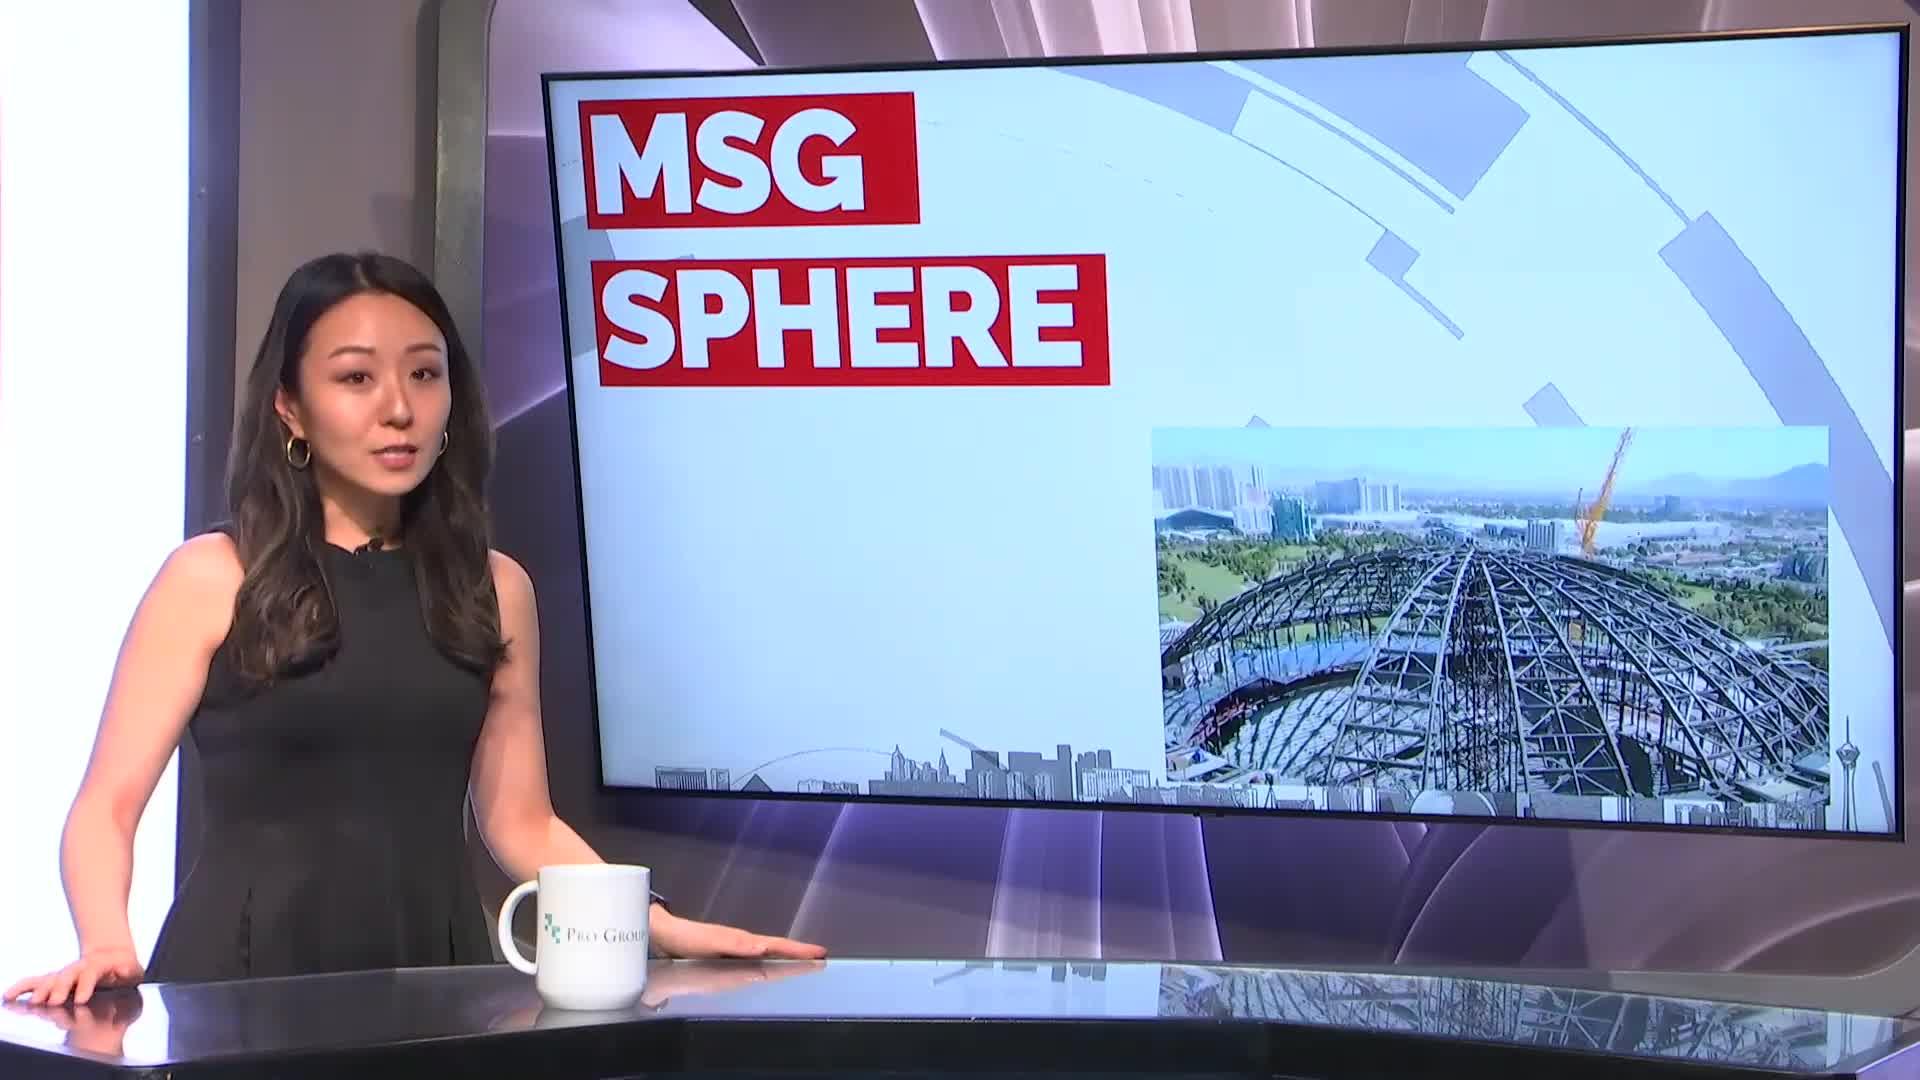 7@7PM MSG Sphere Makes Progress